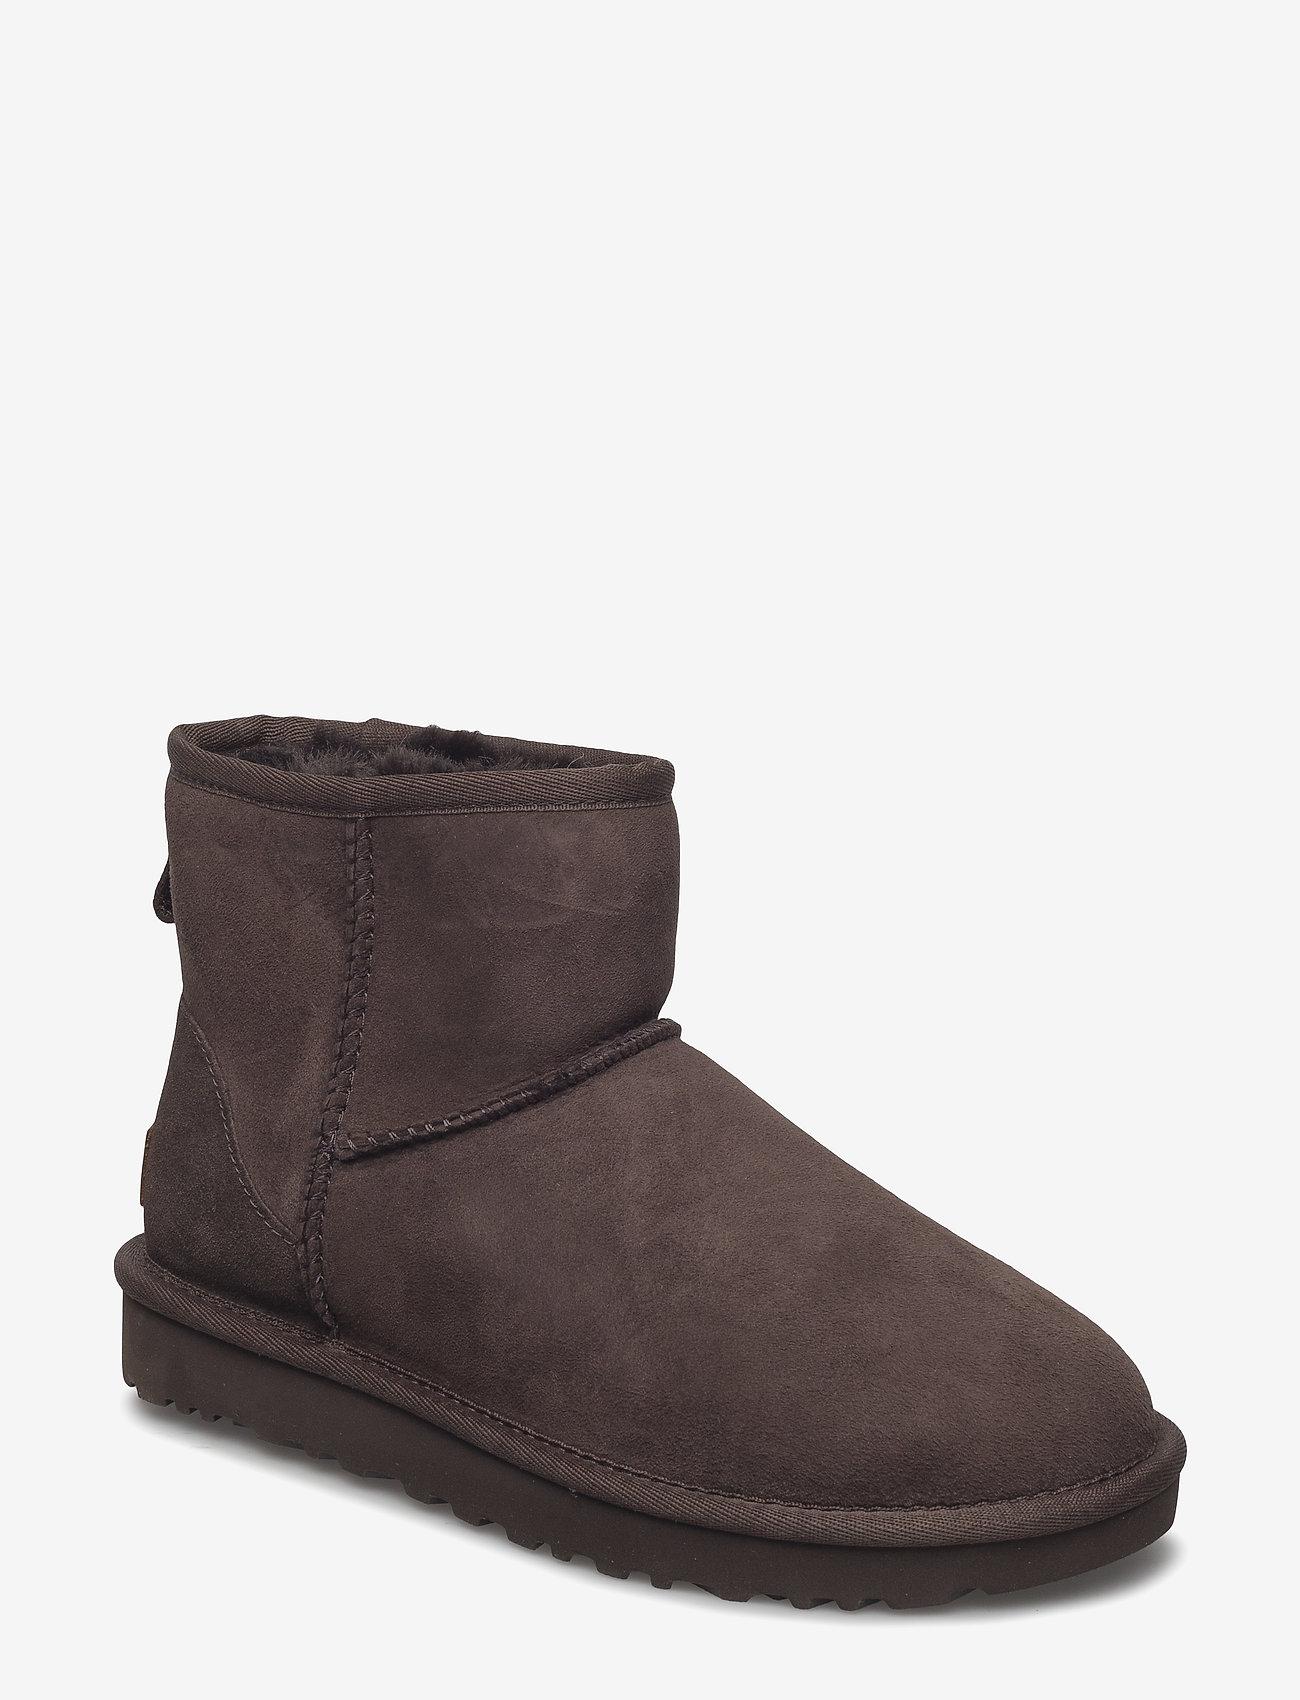 UGG - W Classic Mini II - flat ankle boots - chocolate - 0